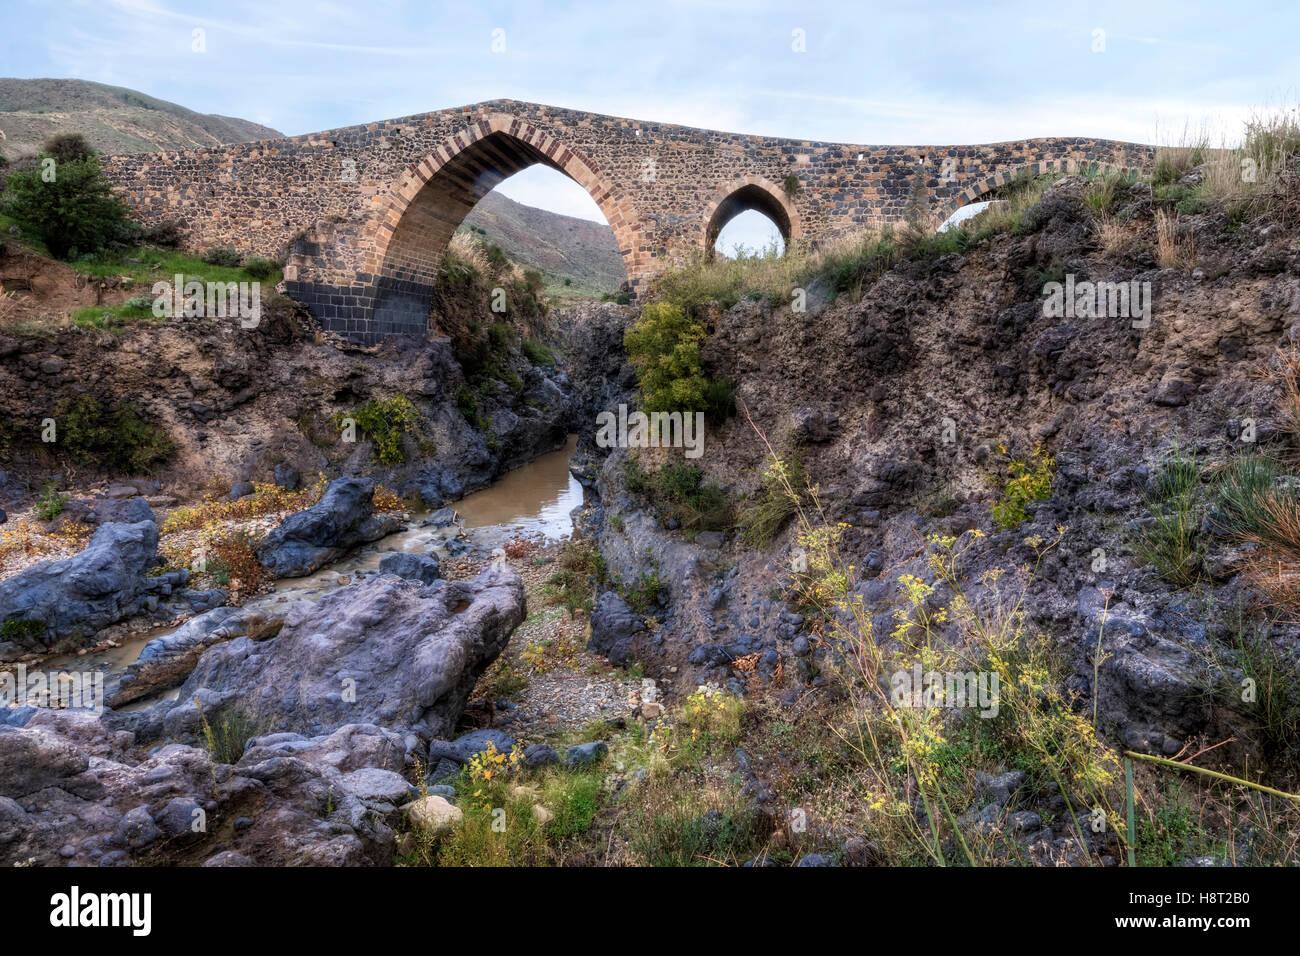 Ponte dei Saraceni, Adrano, Sicily, Italy - Stock Image